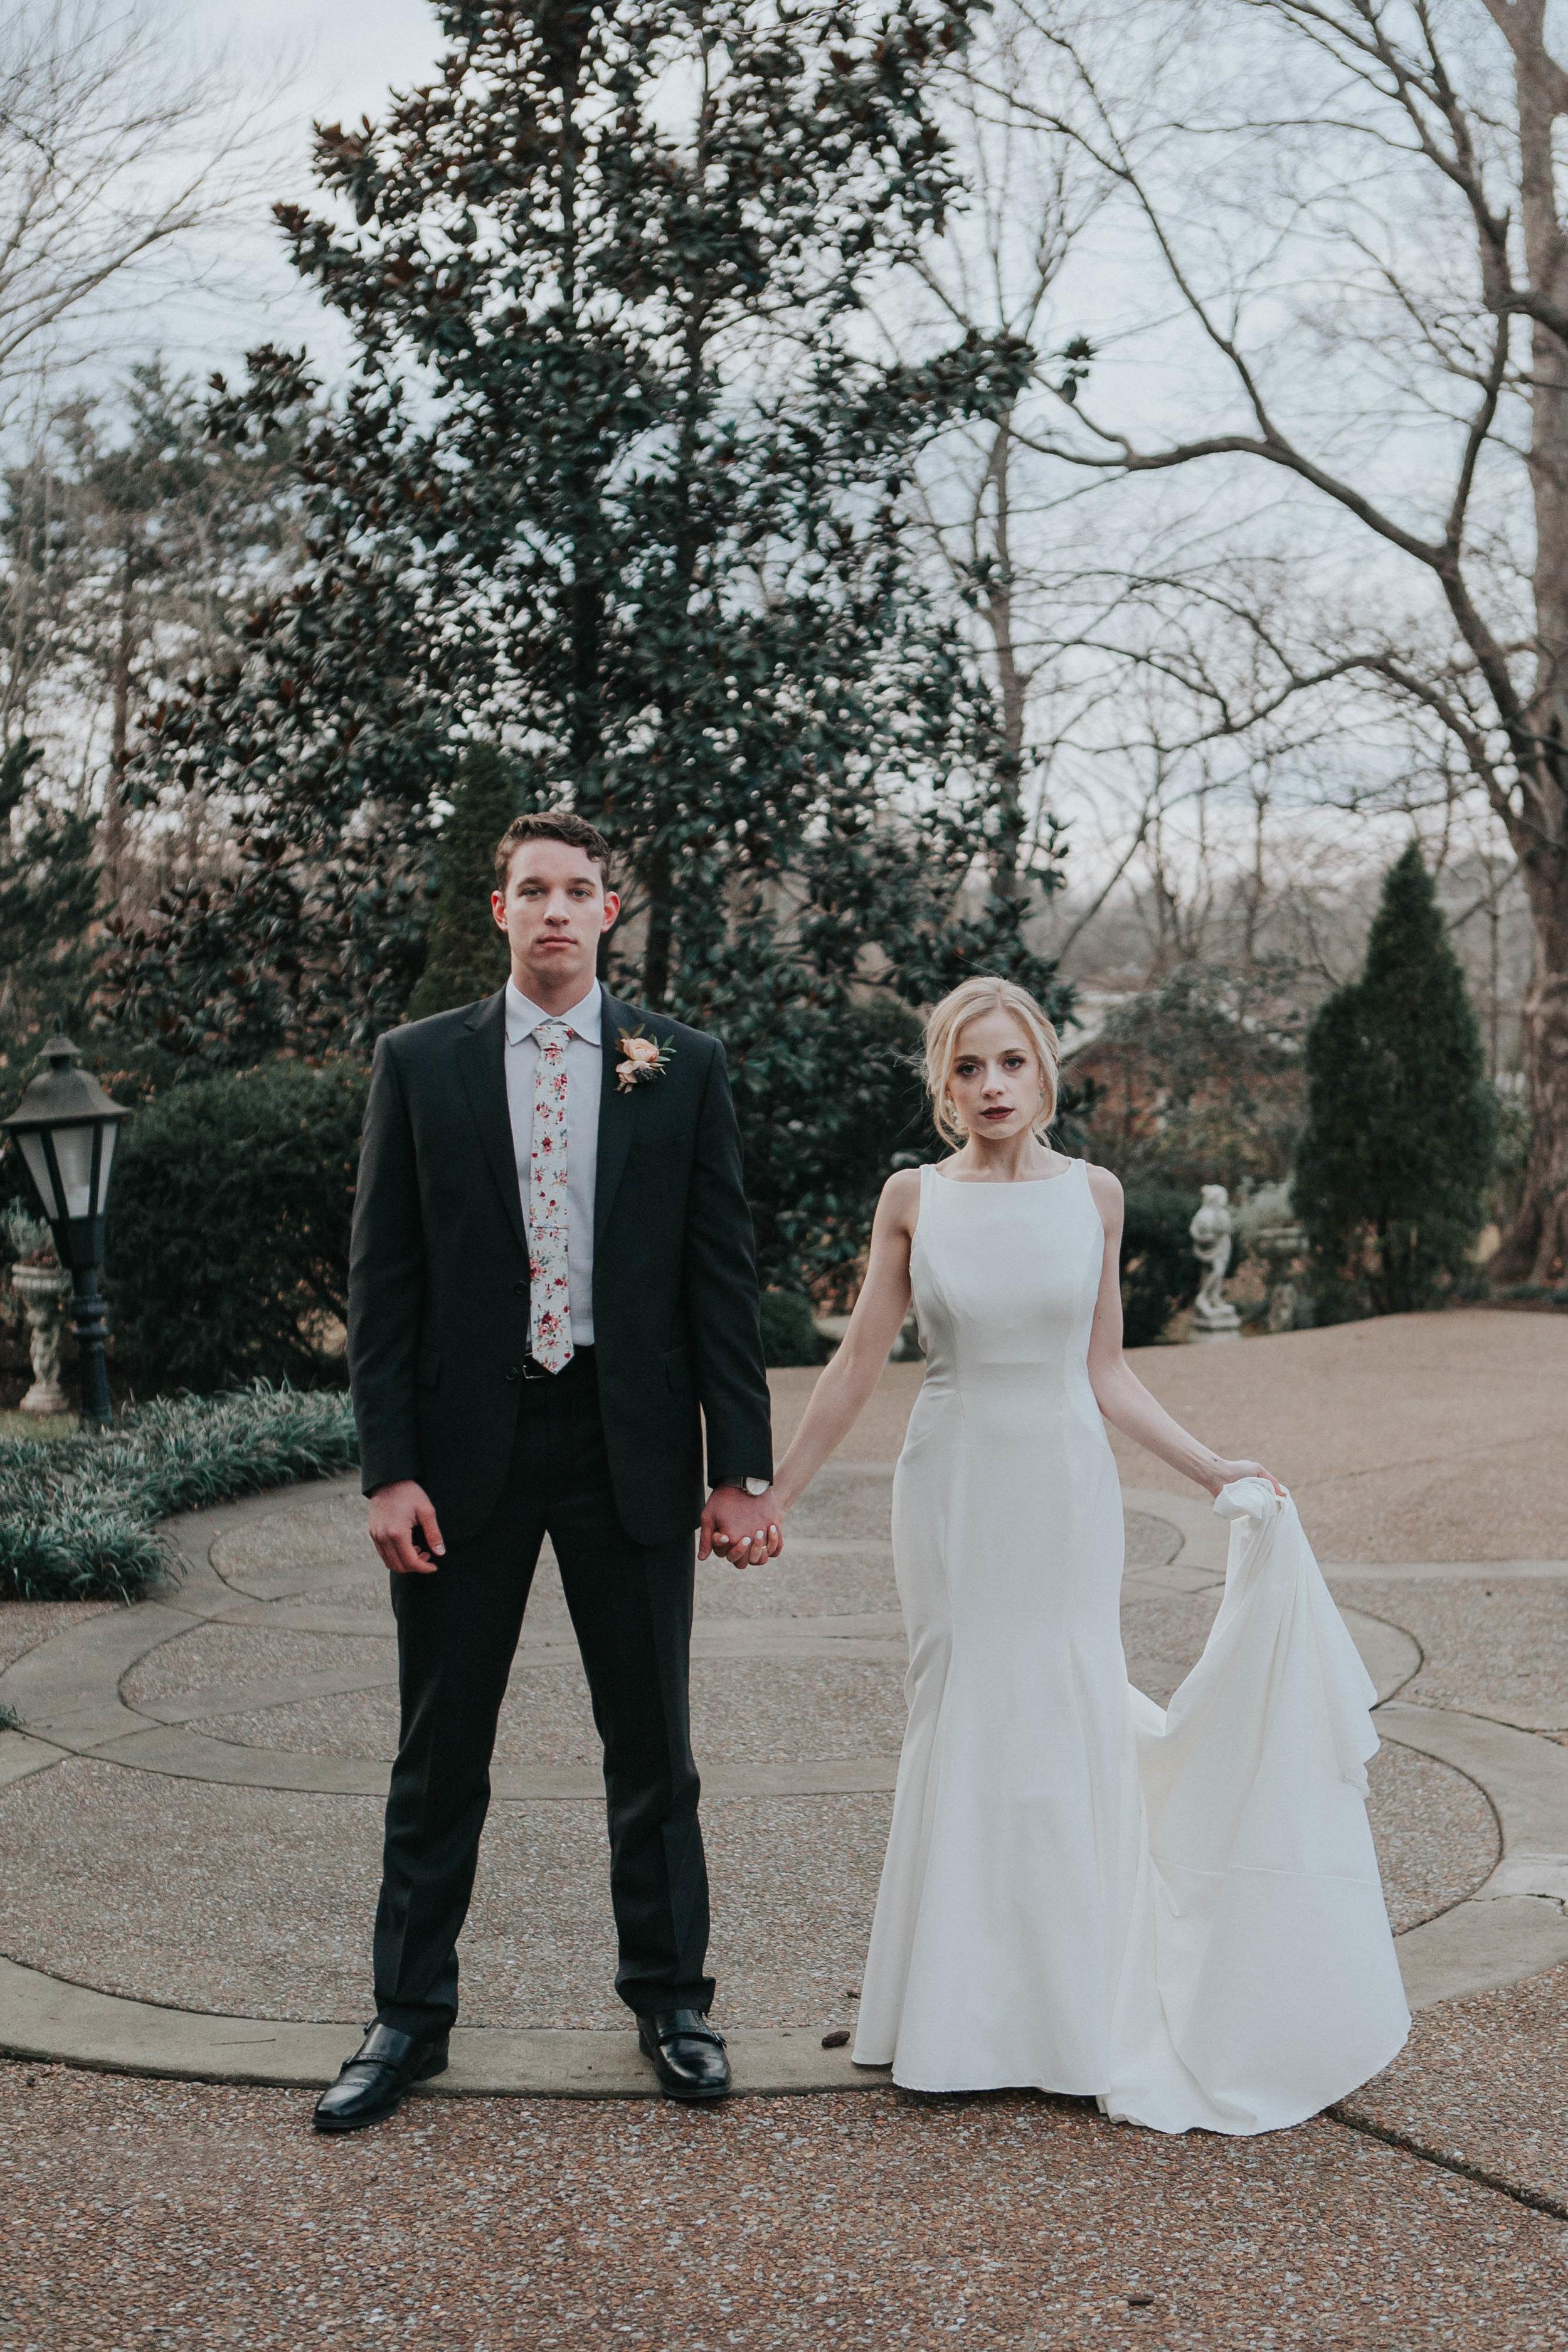 Charis_Lauren_Romantic_Wedding_Photographer_Nashville_01190.jpg